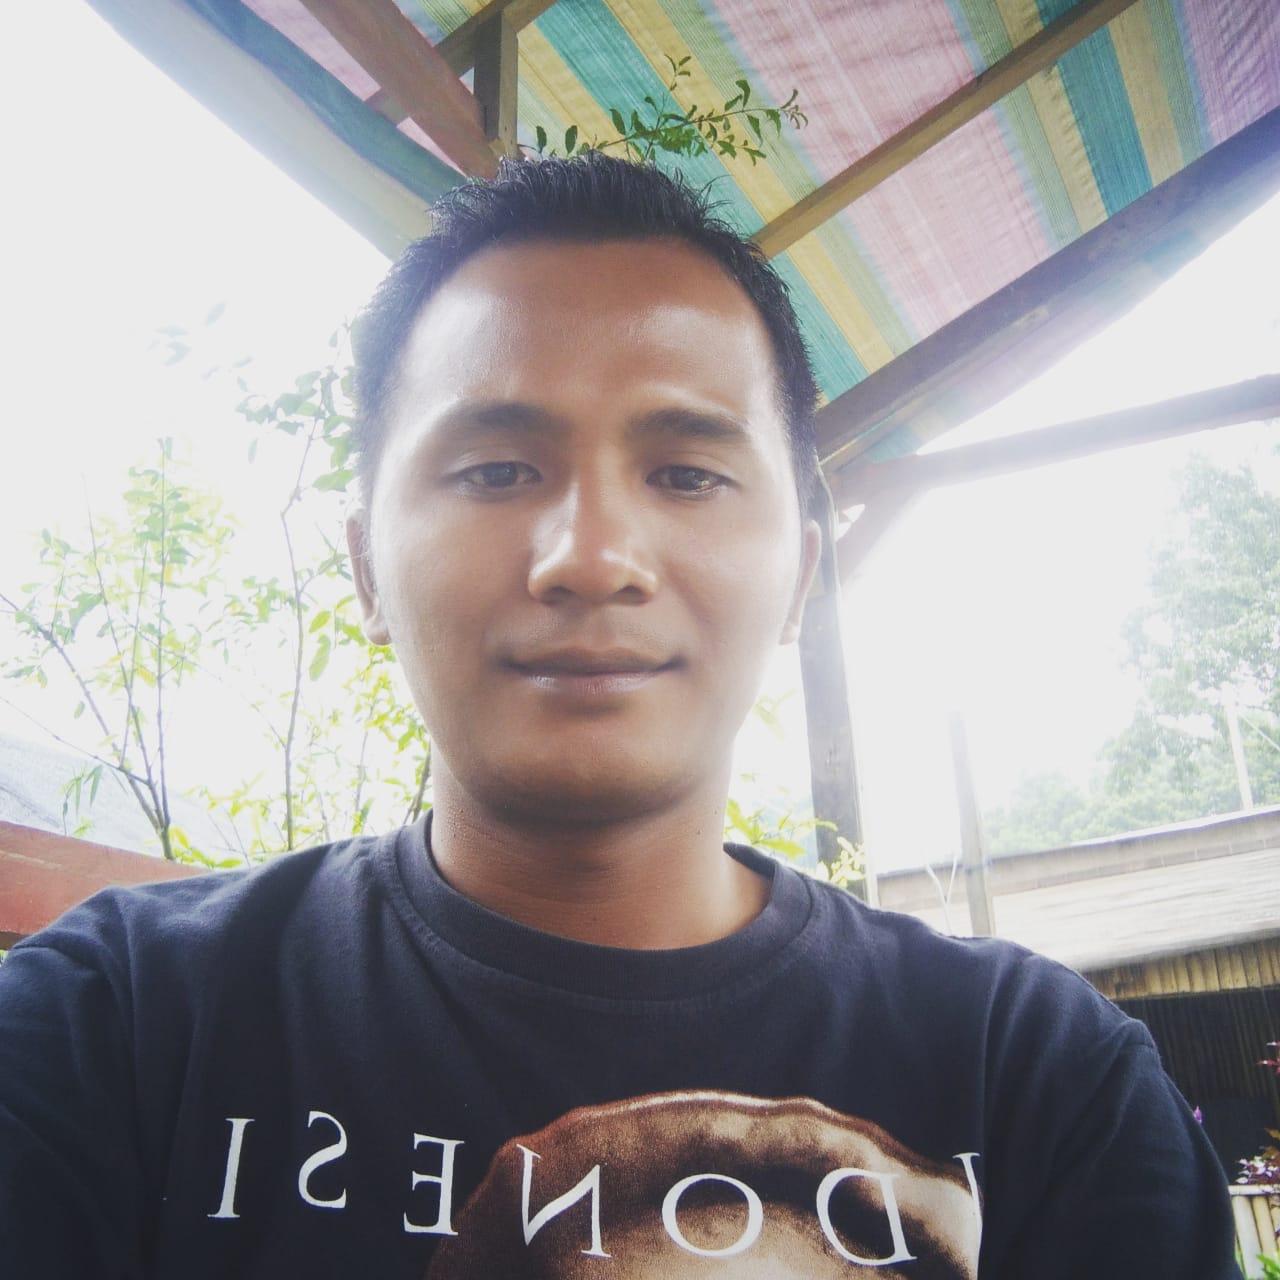 DPC GBNN Gunungsitoli Minta Pemimpin Tertinggi TNI – AD Segera Memberikan Secara Resmi Klarifikasi Atas Meninggalnya Serda IBG